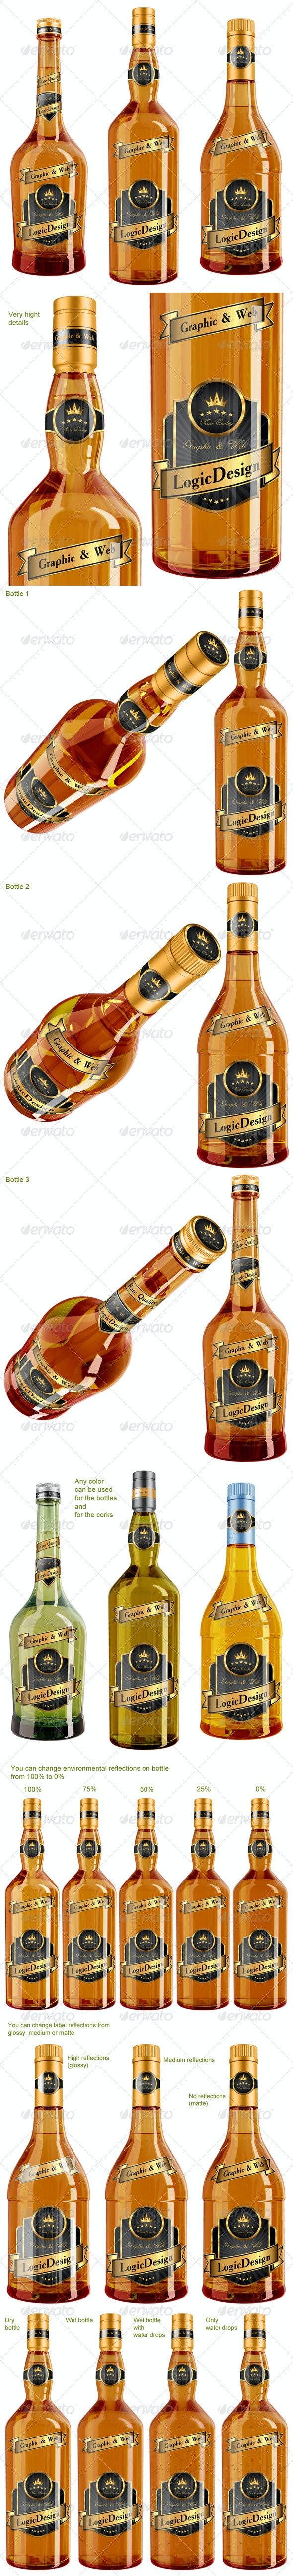 Whisky & Cognac Bottle Mock Up - Food and Drink Packaging